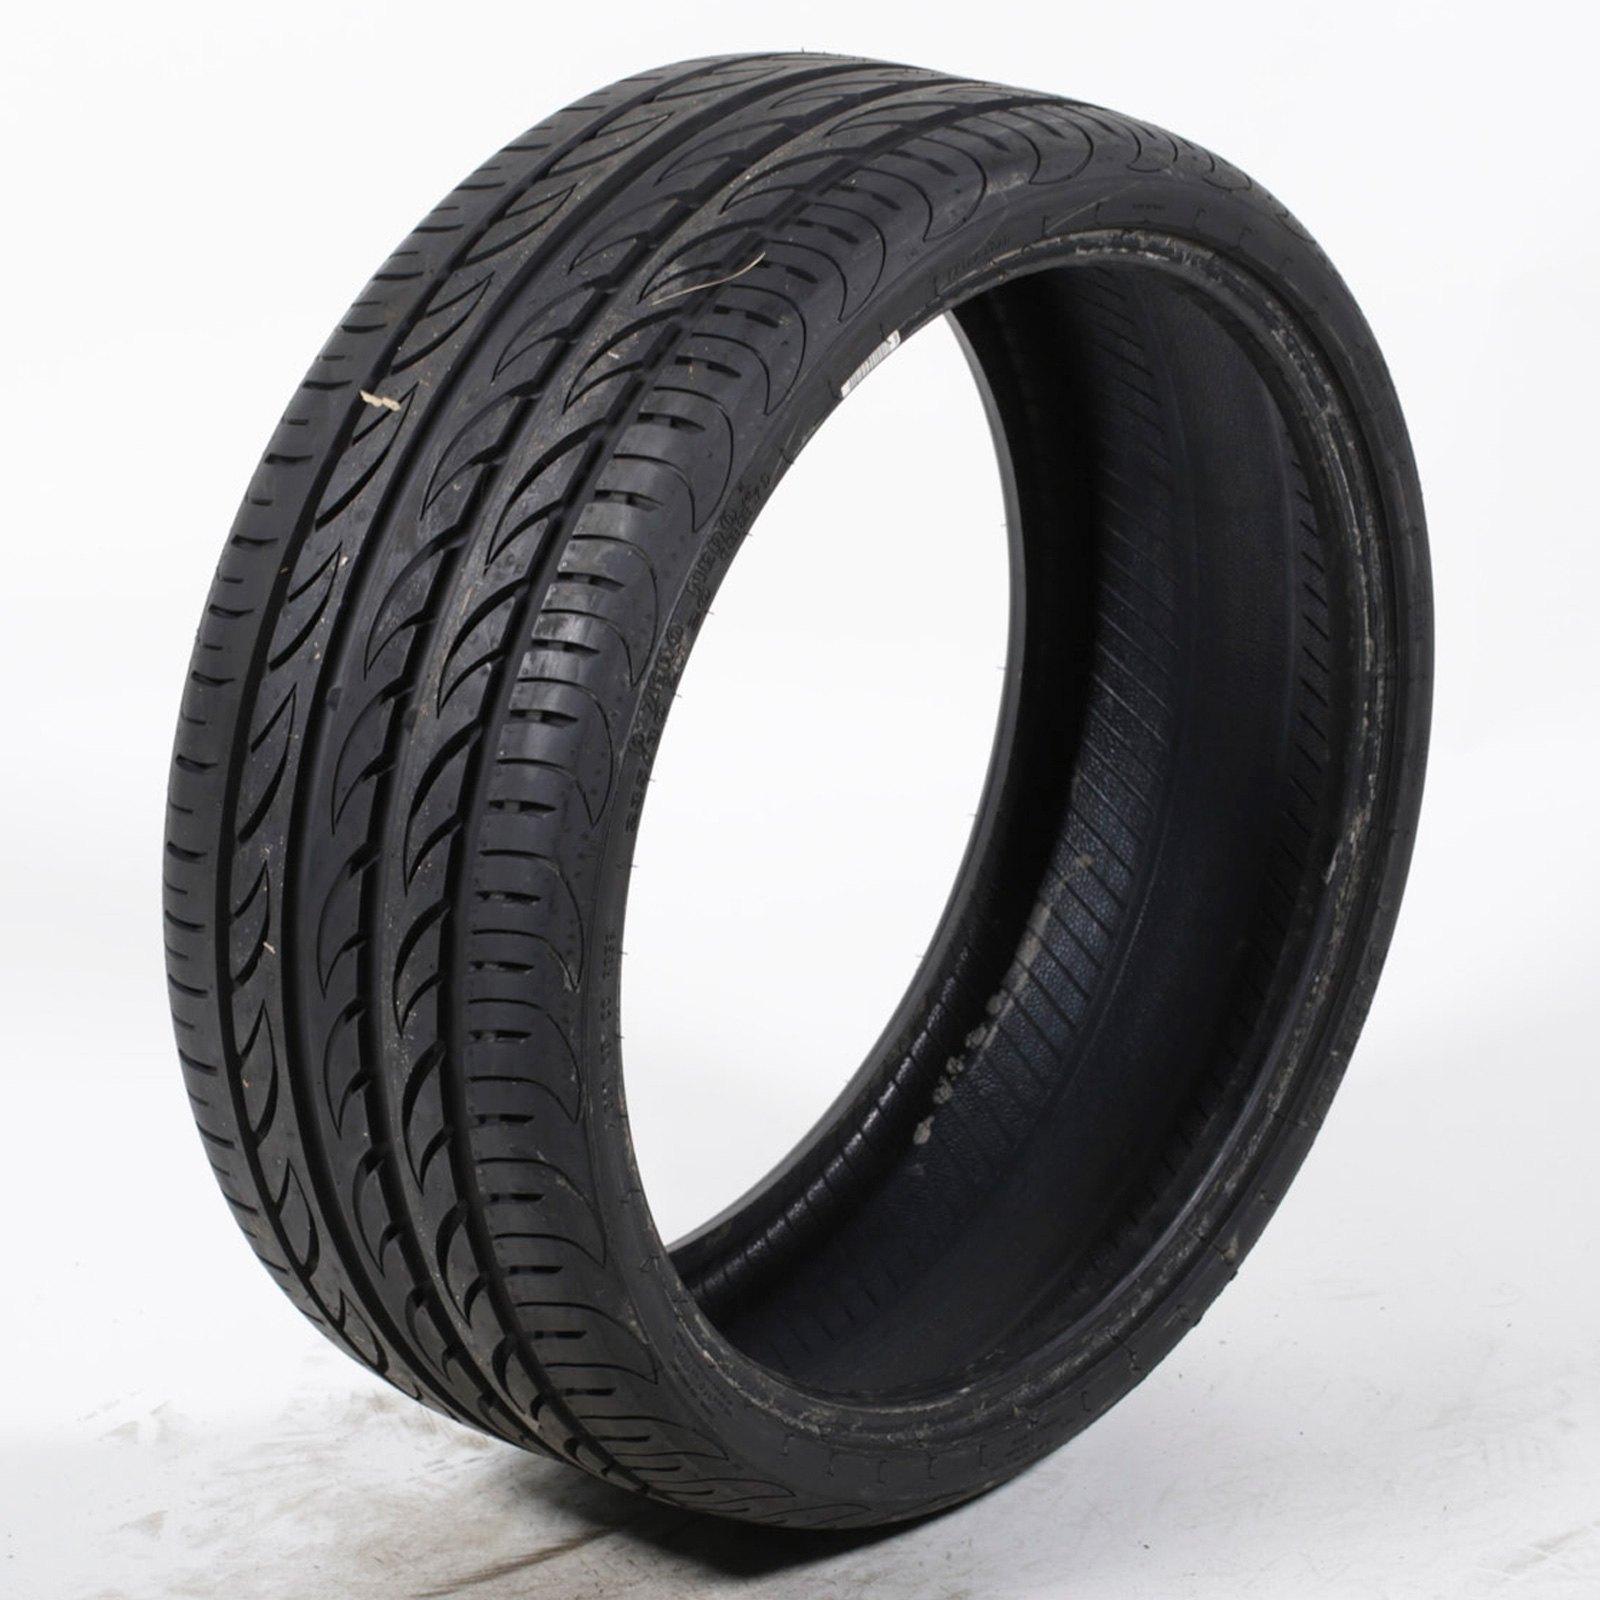 pirelli tire 235 30r 20 88y p zero nero summer. Black Bedroom Furniture Sets. Home Design Ideas